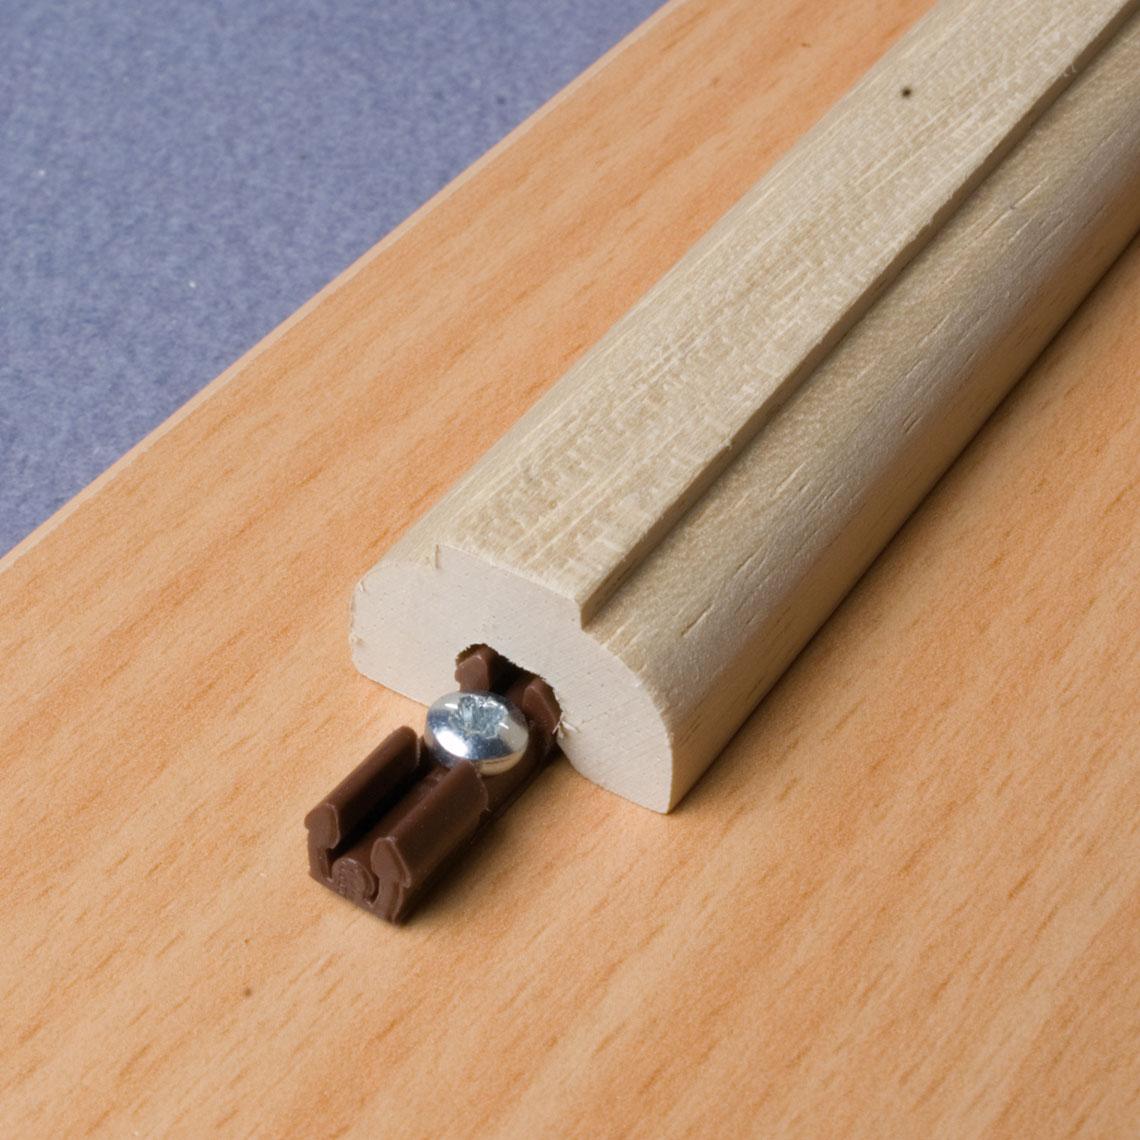 QUICK-SET 2-Part Locking Dowel Cabinet fasteners